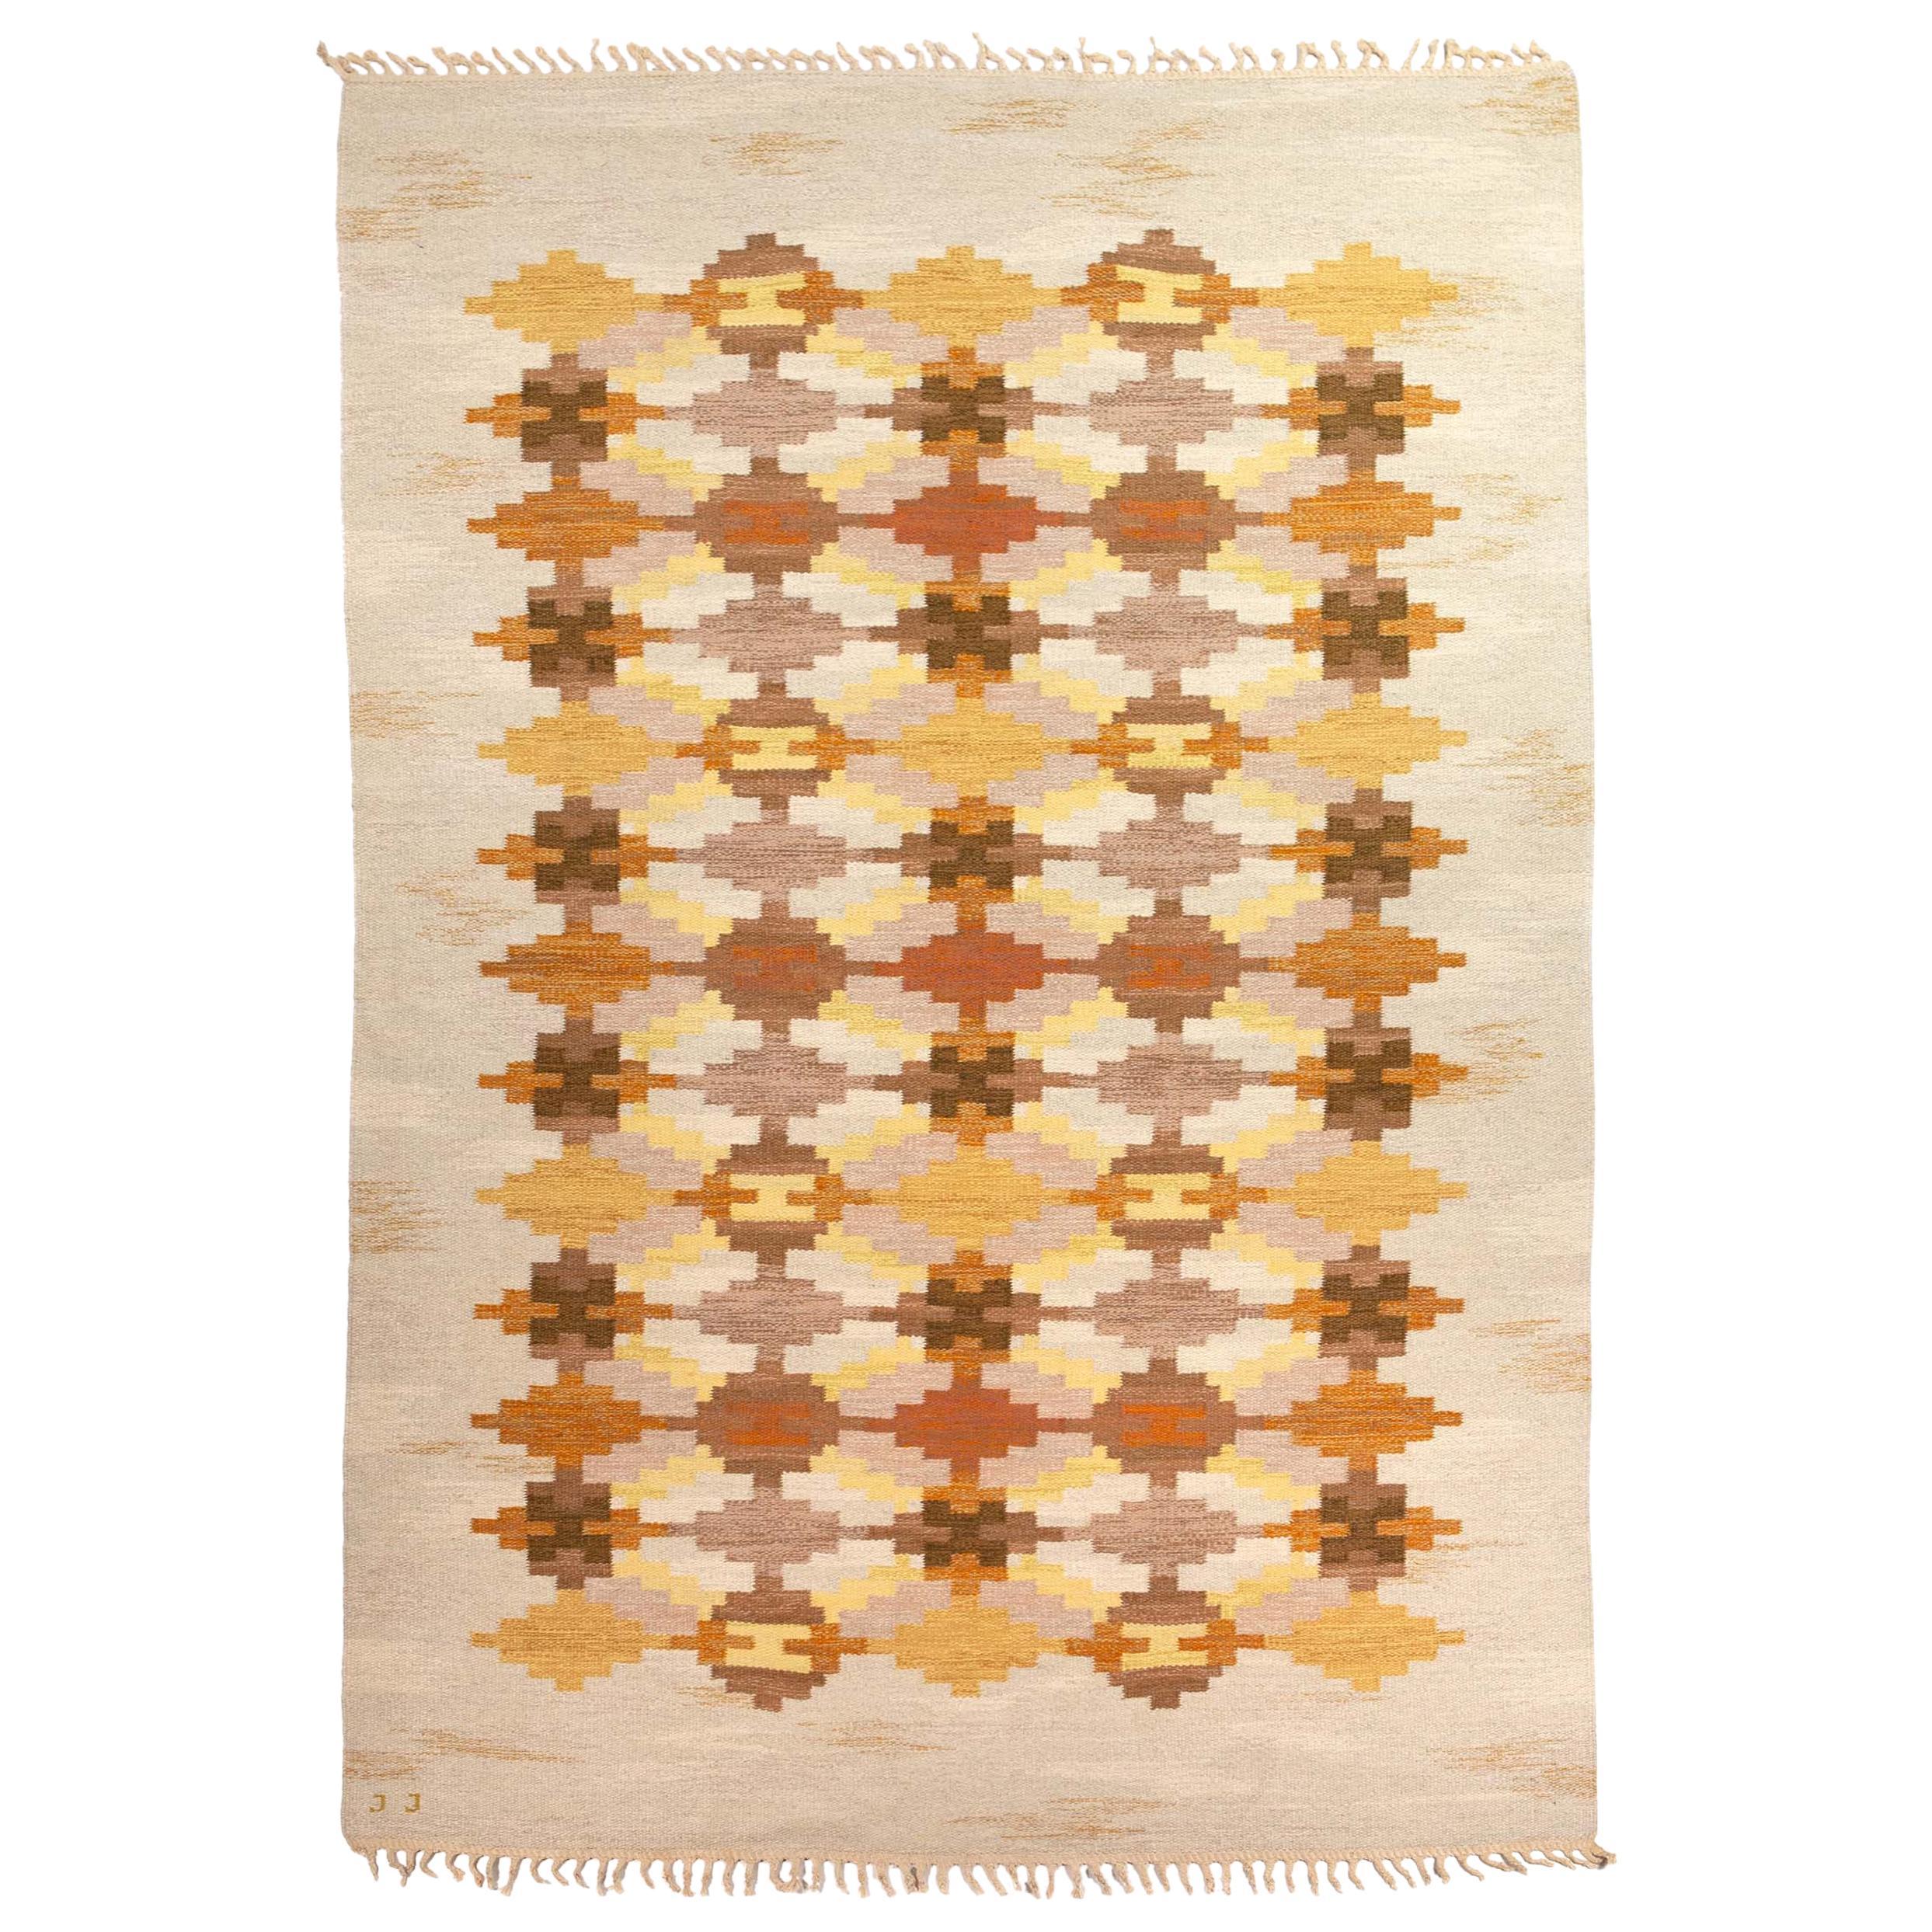 Judith Johansson Handwoven Flat-Weave Rug Signed JJ, Sweden, 1960s